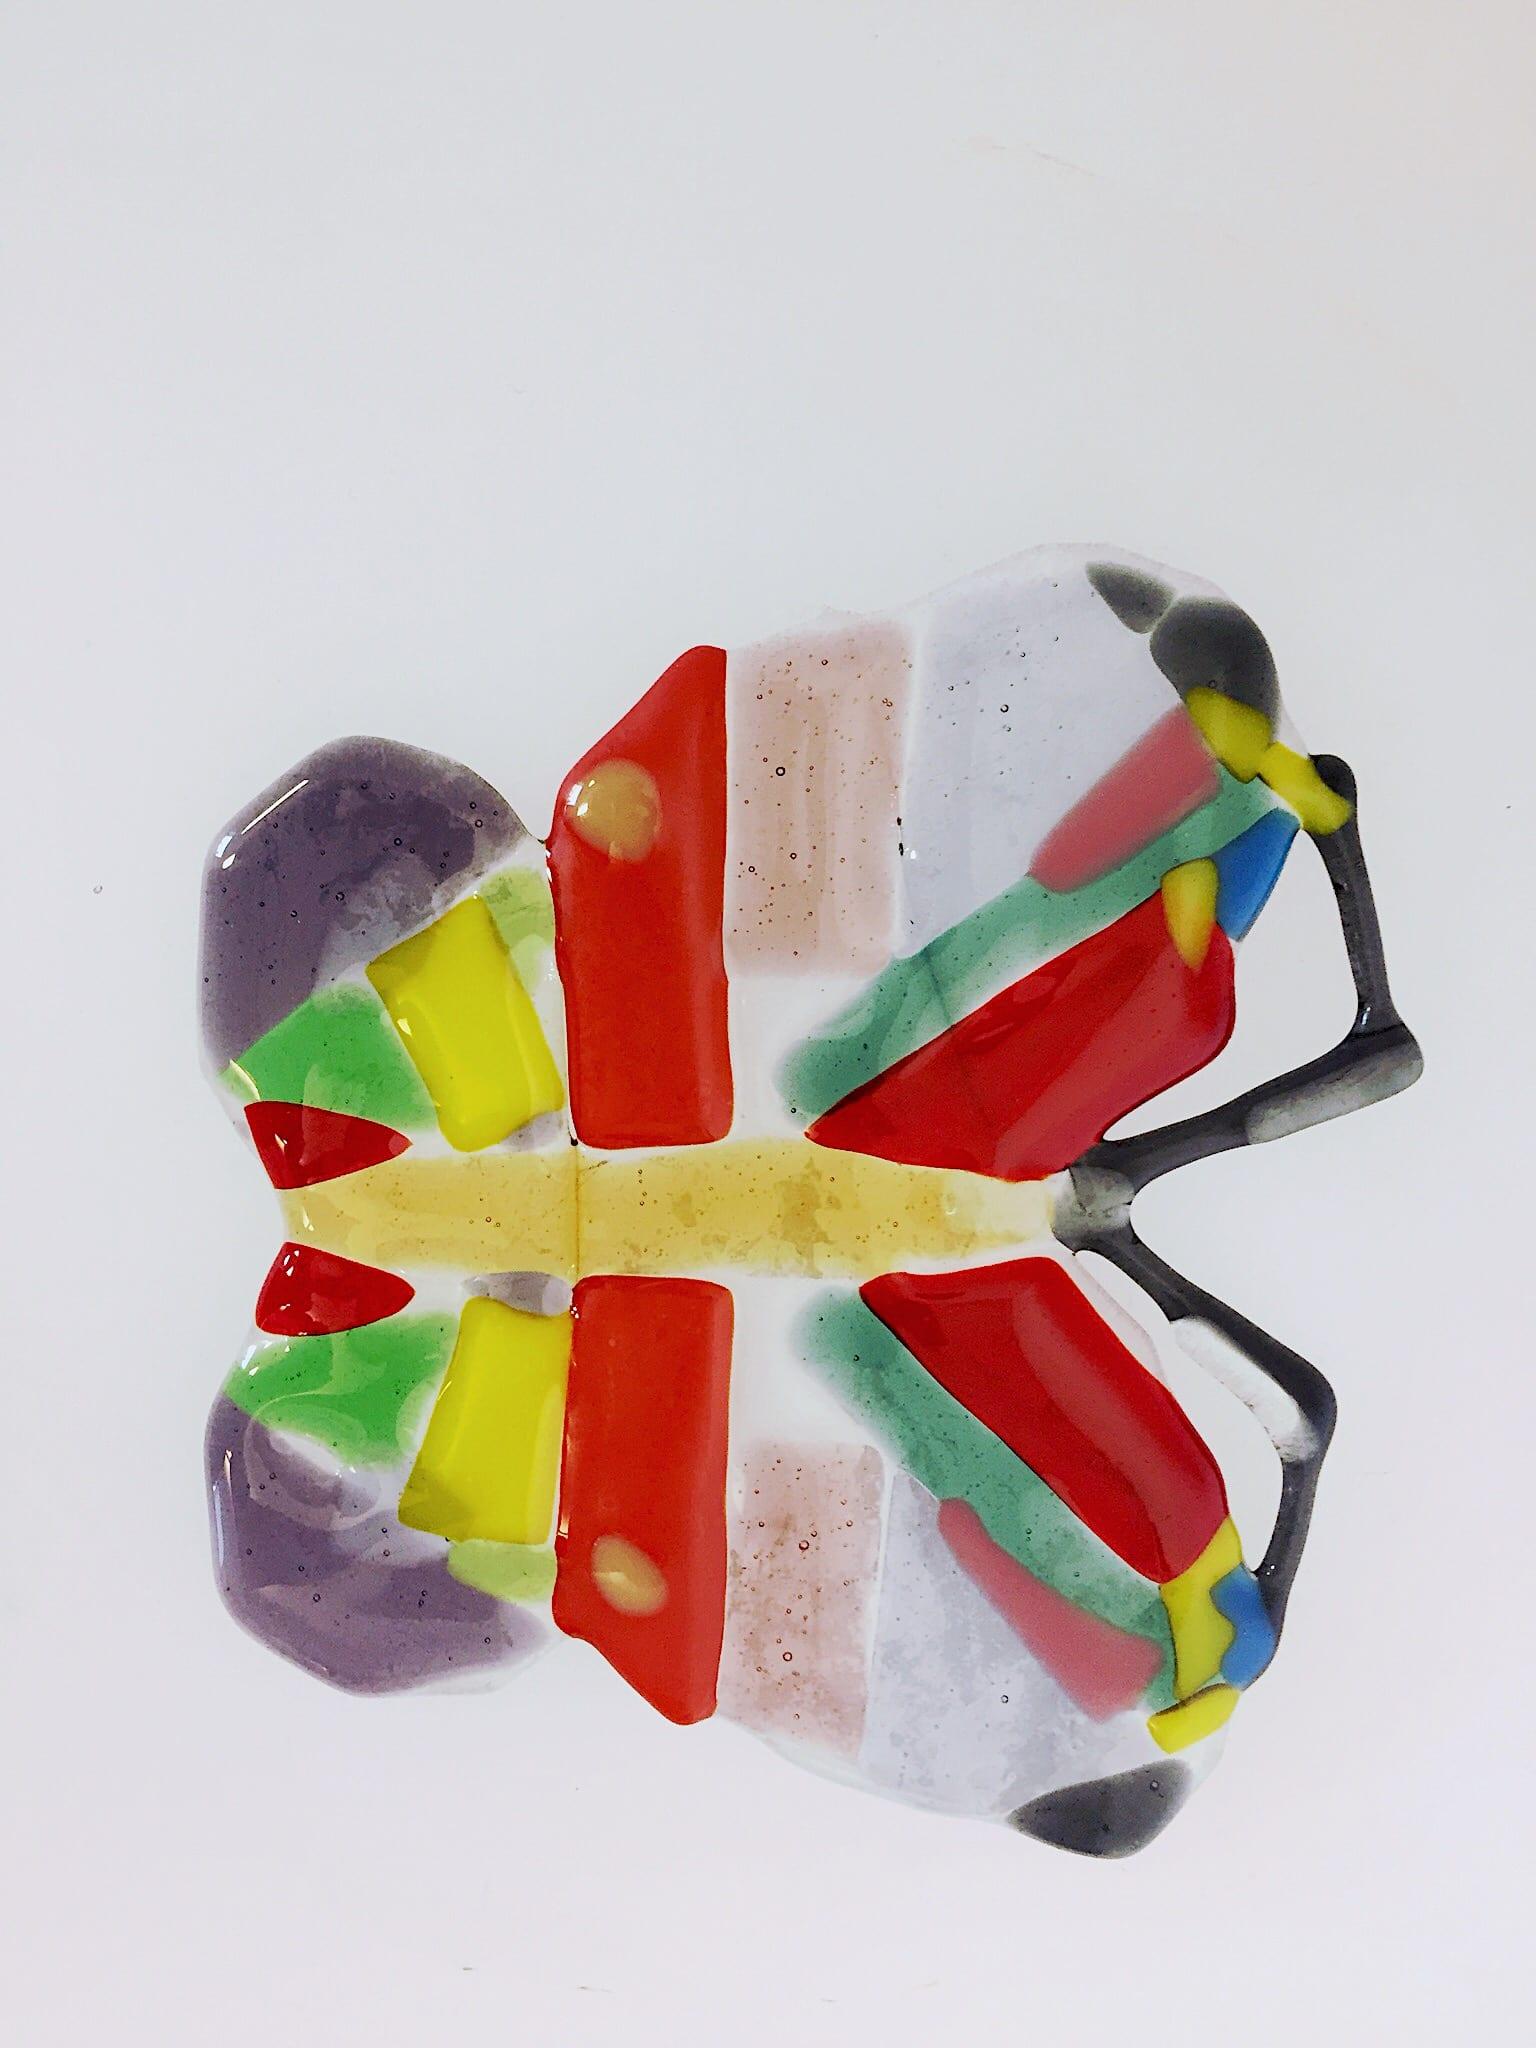 Handmade flower seasonal glass decoration